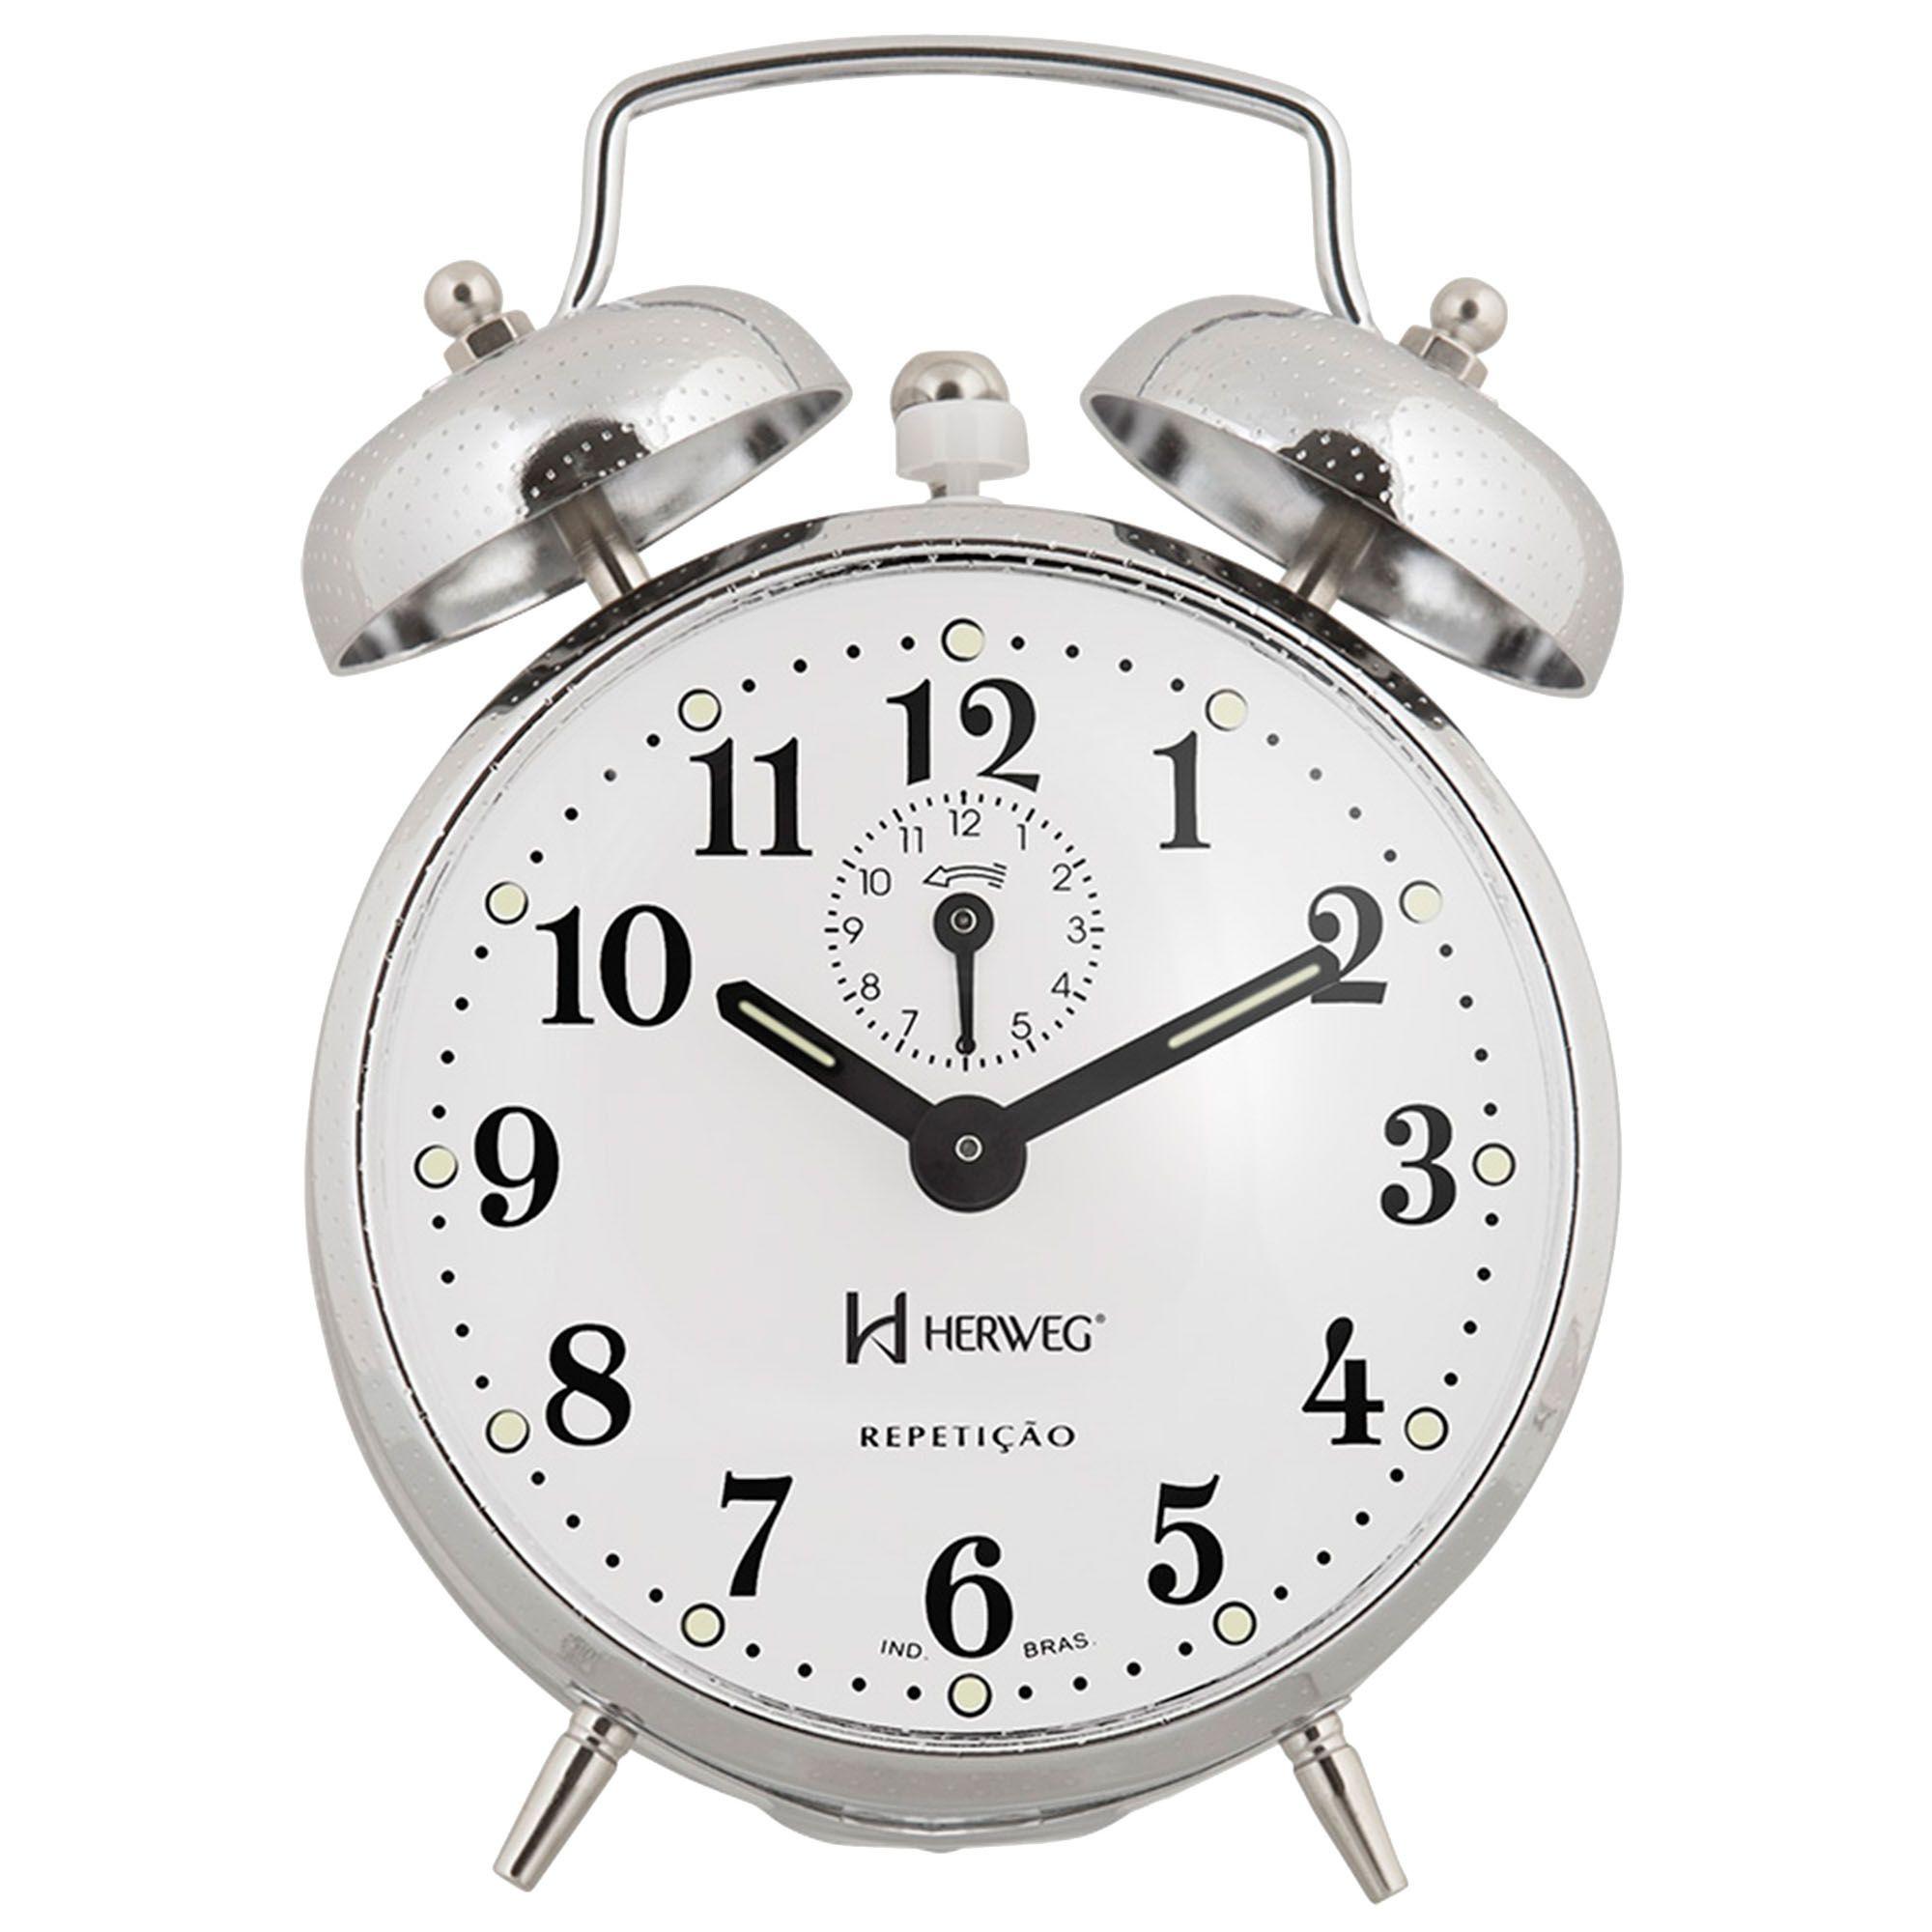 Despertador Analógico Mecânico Herweg 2370 207 Cromado Picotiado